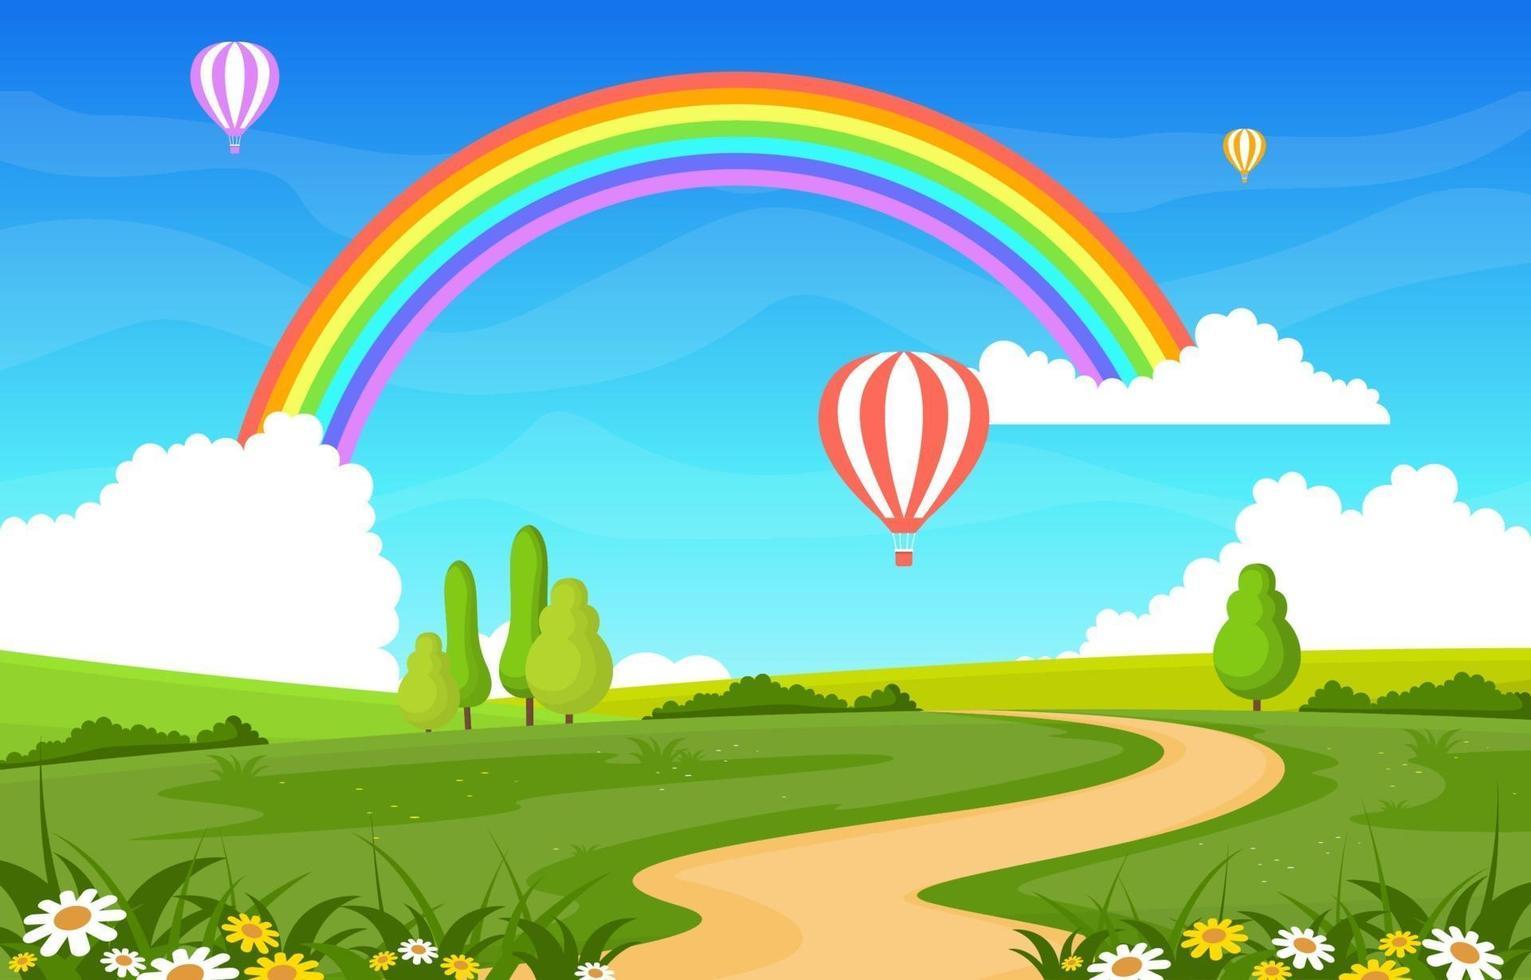 Winding Road Rainbow Nature Landscape Scenery Illustration vector